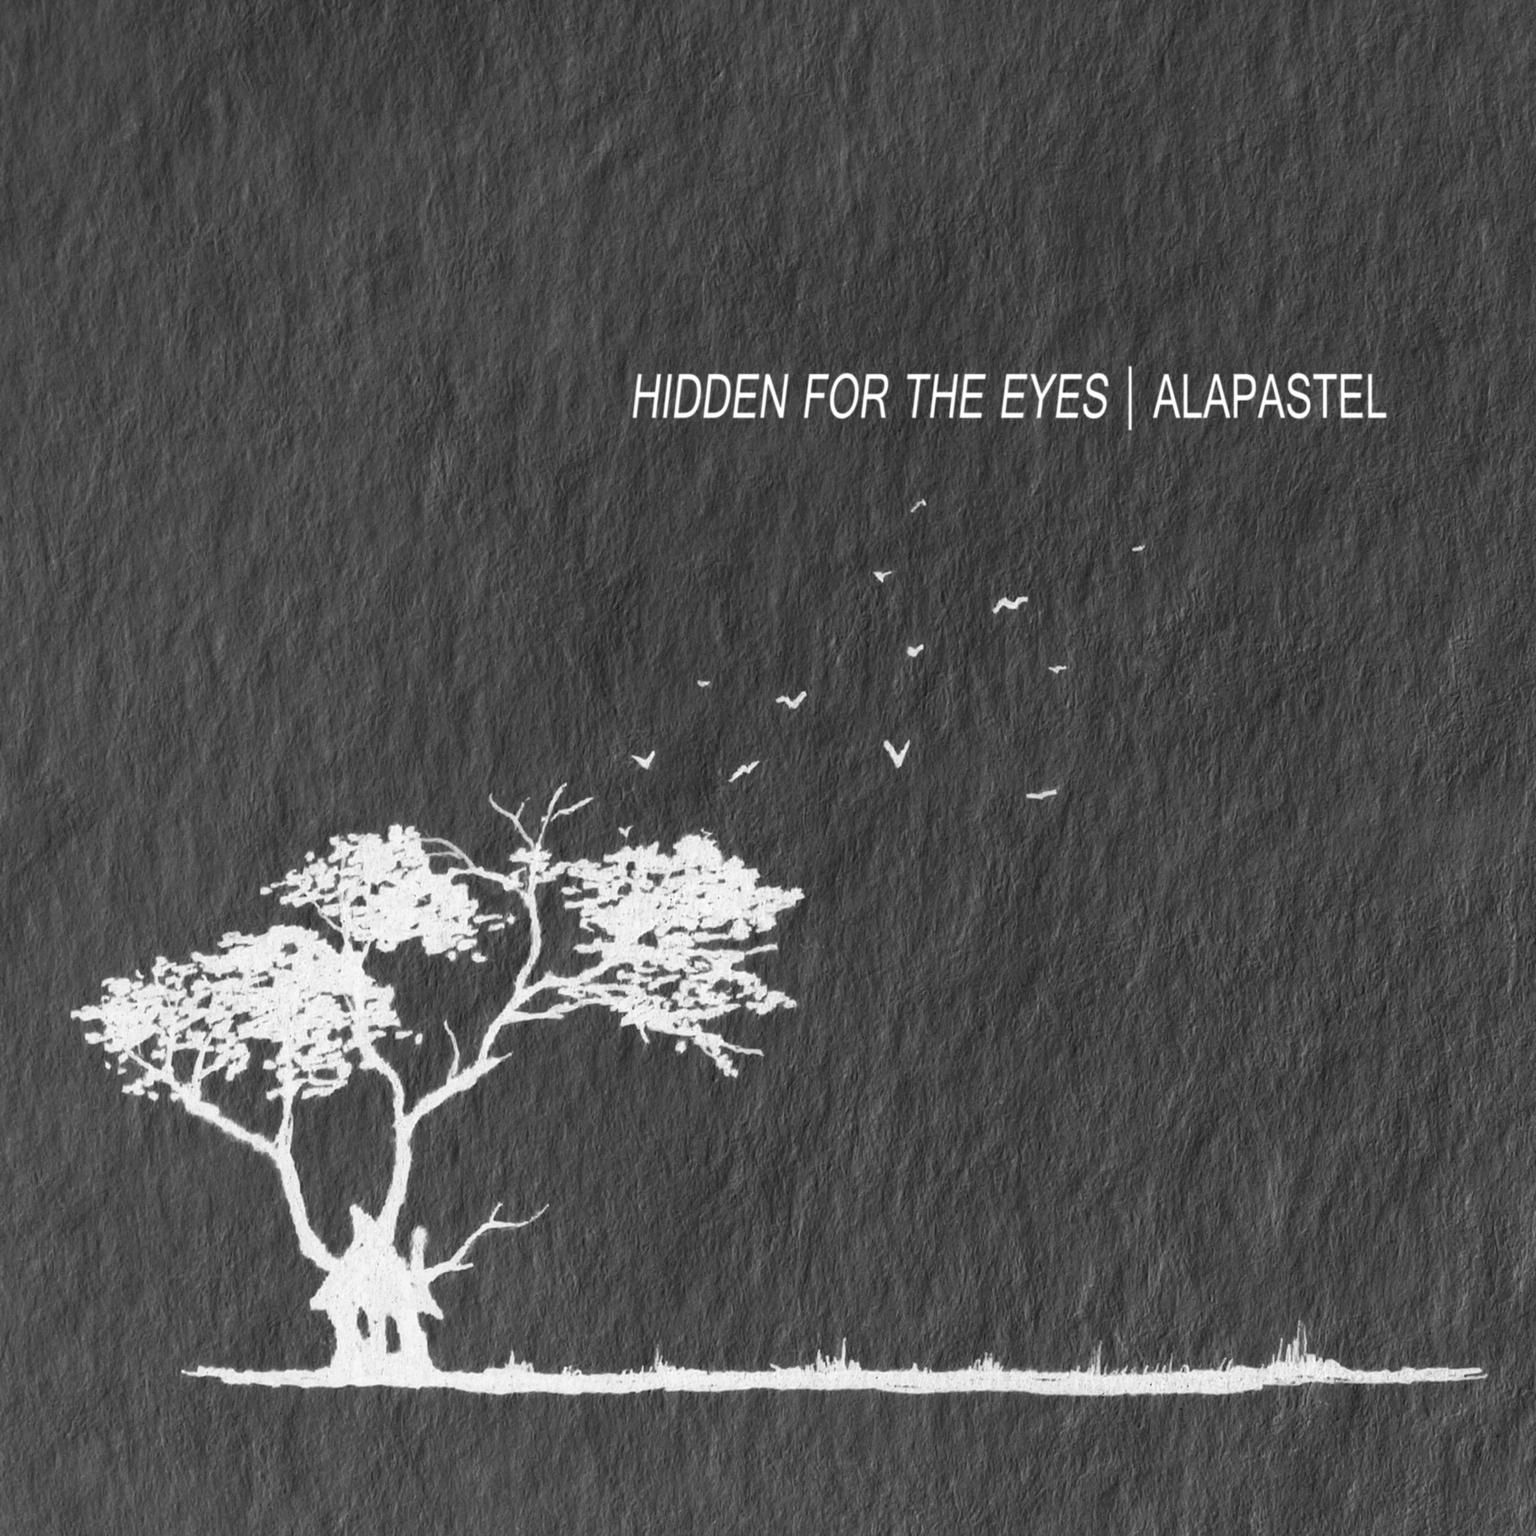 Alapastel - Hidden for the eyes (Cover - Silvia Bobekova art)